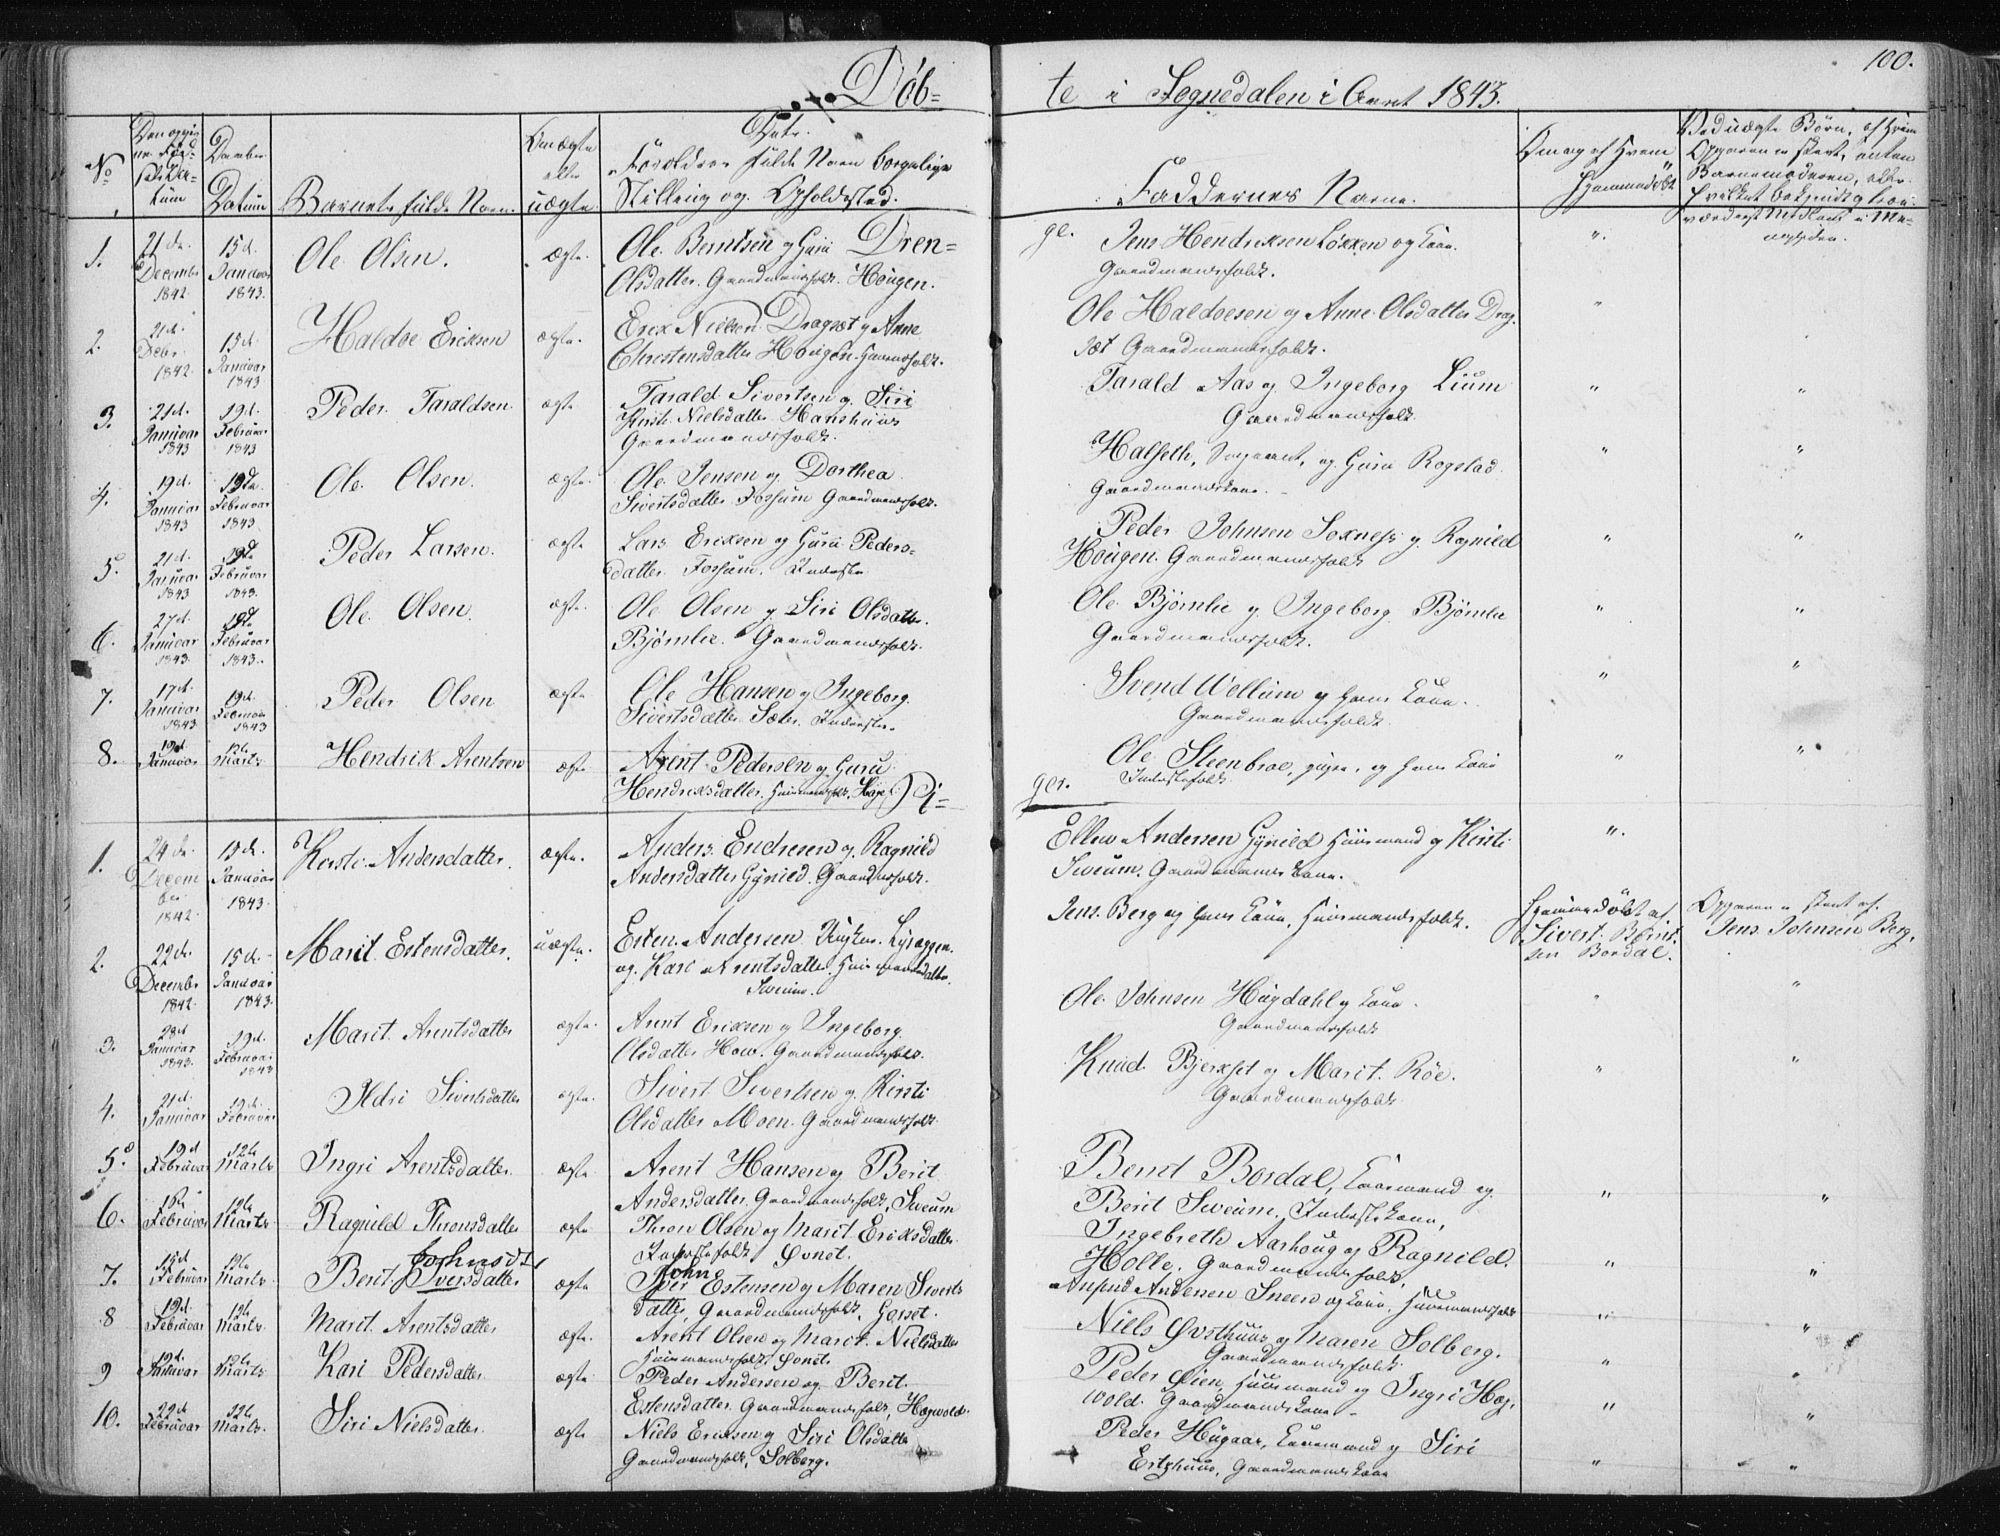 SAT, Ministerialprotokoller, klokkerbøker og fødselsregistre - Sør-Trøndelag, 687/L0999: Parish register (official) no. 687A05 /3, 1843-1848, p. 100